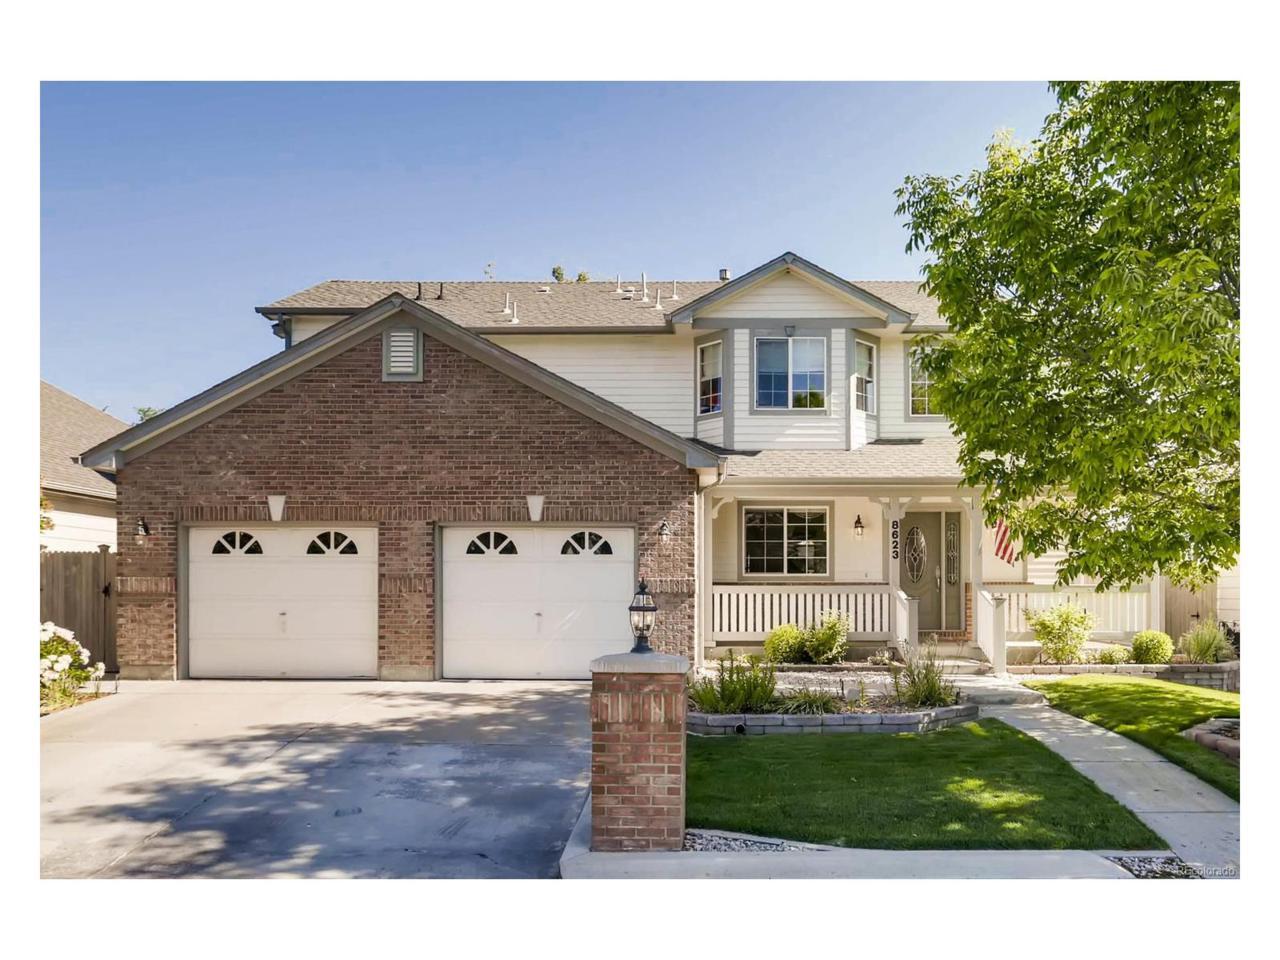 8623 E 105th Court, Henderson, CO 80640 (MLS #8167799) :: 8z Real Estate